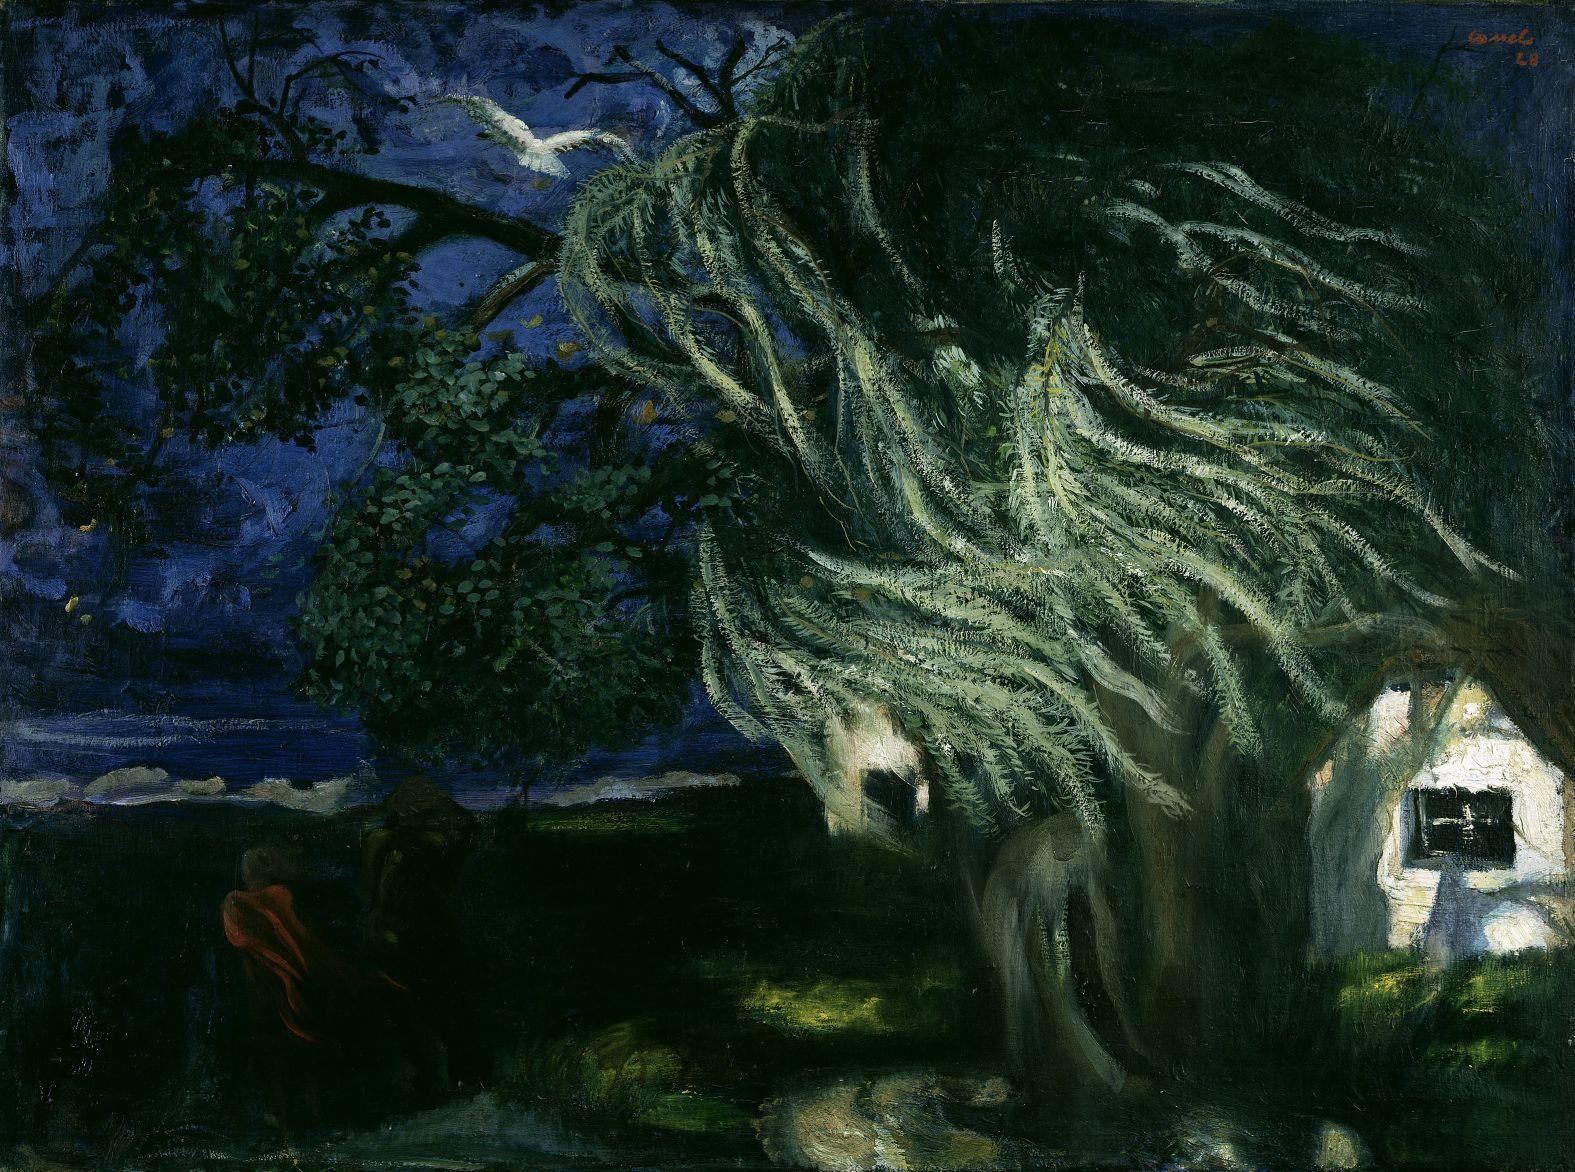 Pol Cassel: Sturm auf Hiddensee, 1928; Copyright:  bpk / Nationalgalerie, SMB